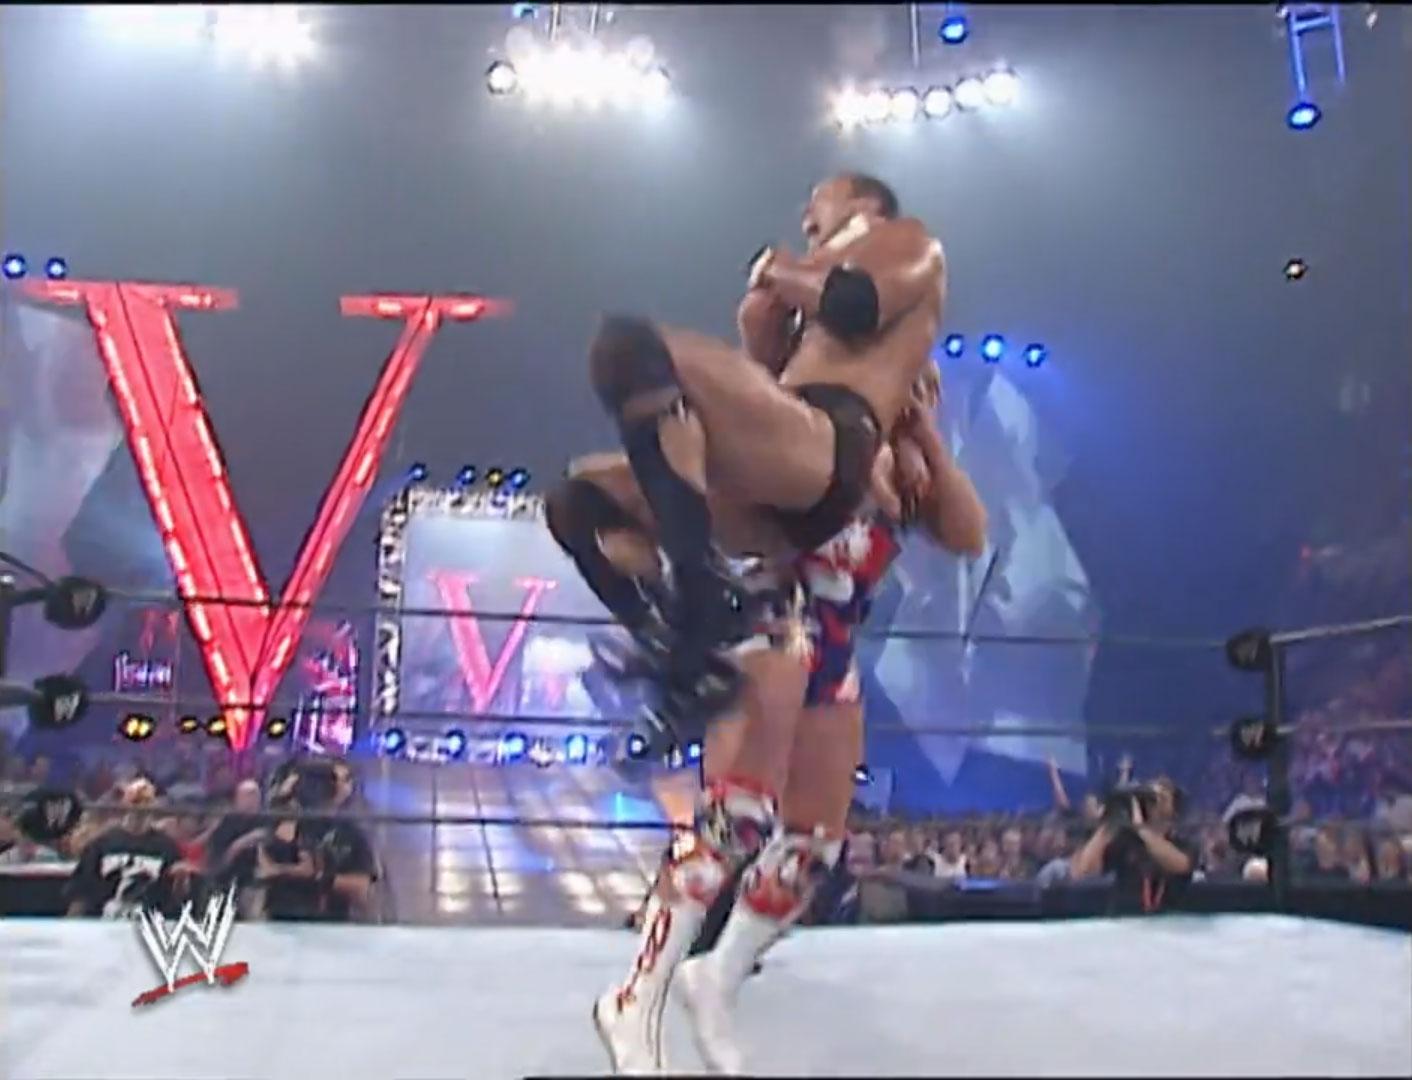 The Rock vs. Kurt Angle vs. The Undertaker Triple-Threat Match, WWE Undisputed Championship WWE Vengeance '02, Jul 21st 2002